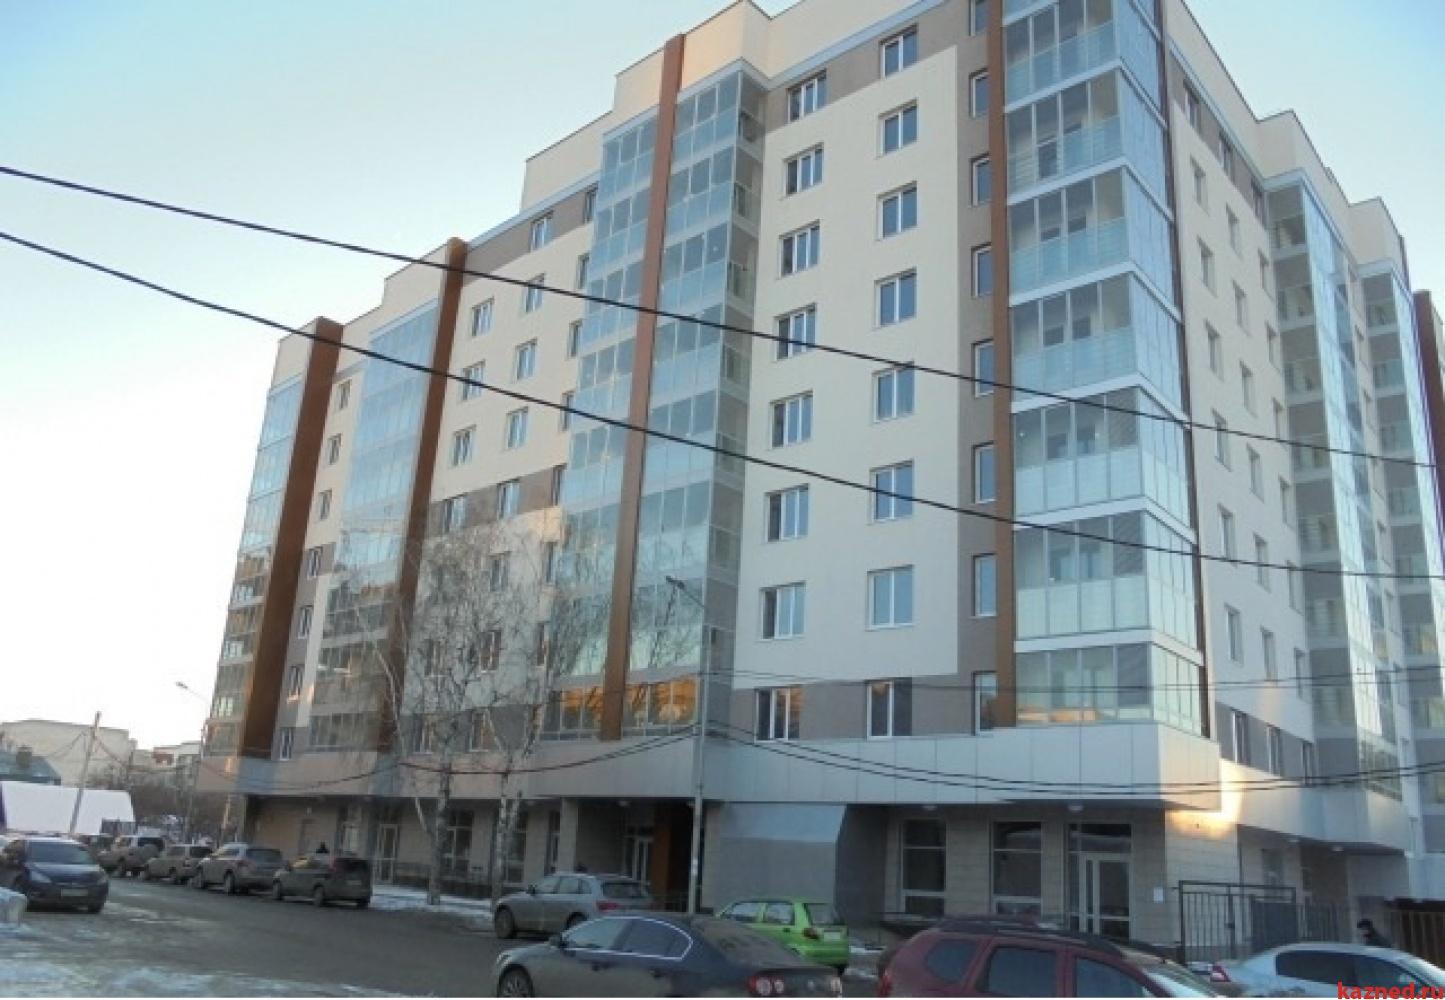 Продажа 1-к квартиры Шуртыгина 8, 49 м2  (миниатюра №1)